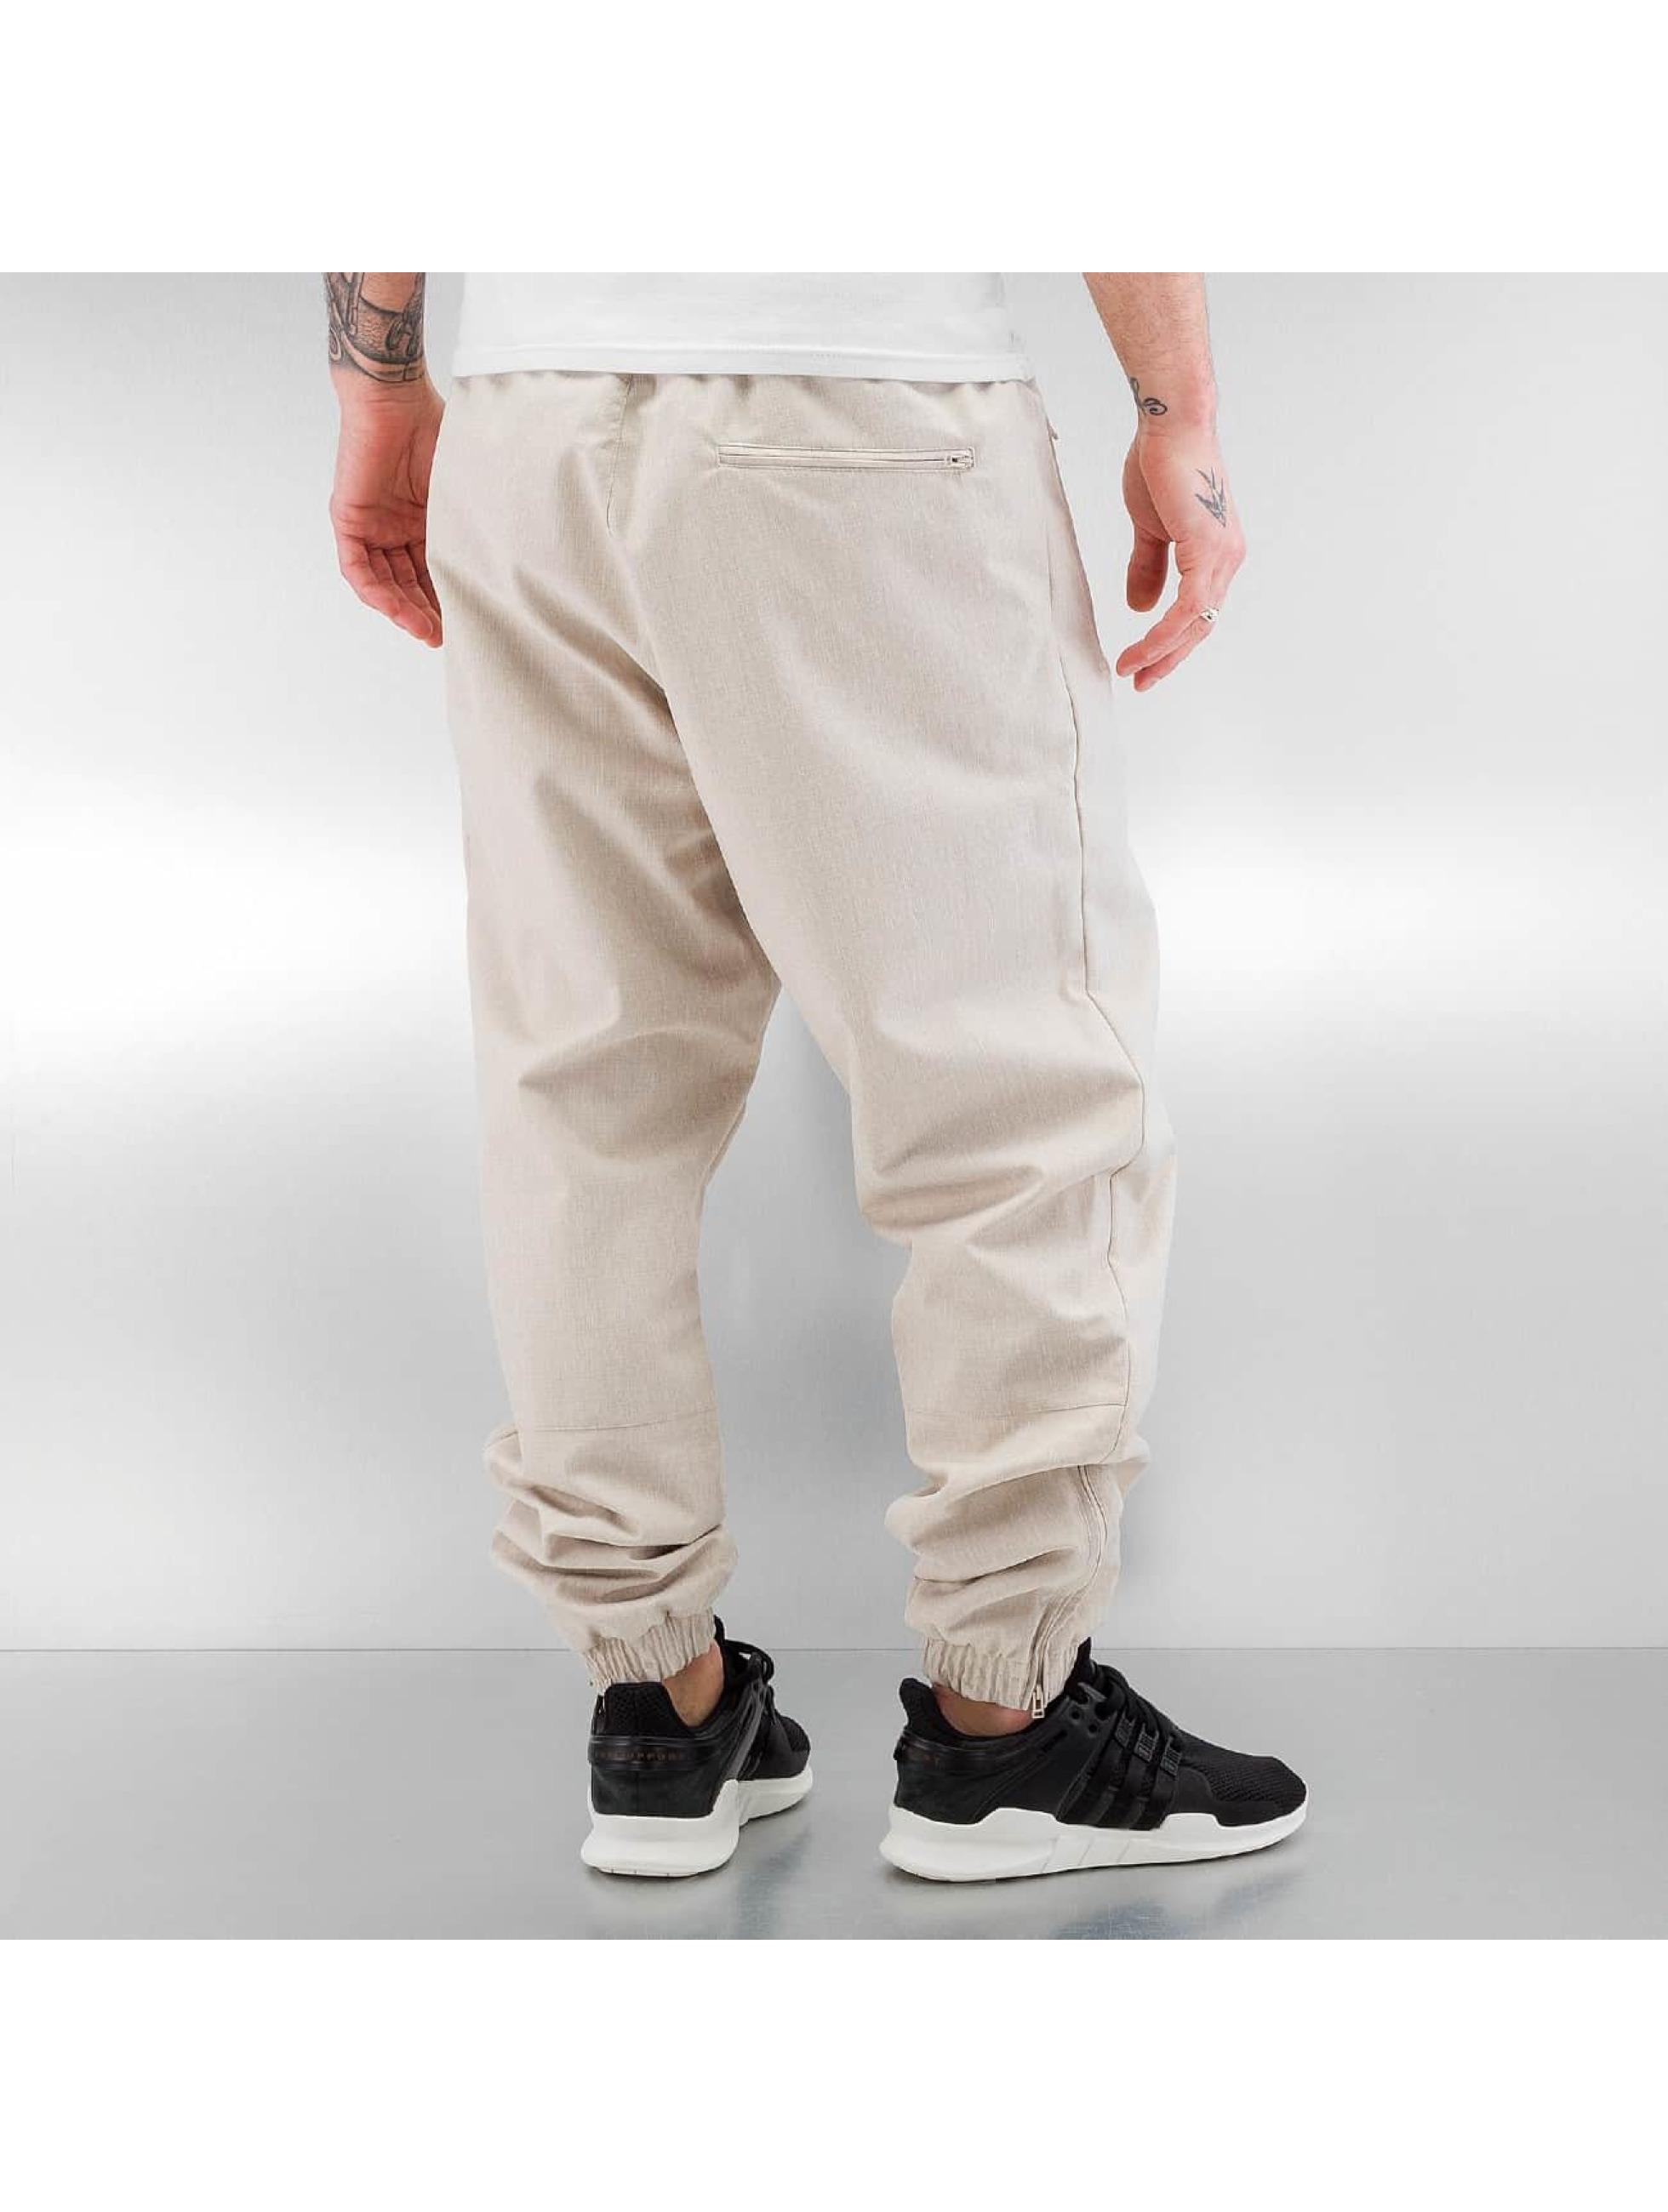 sale retailer d1422 937cd Jogginghose Hosen Orinova Adidas Ebay Herren xUEwEcPqZC